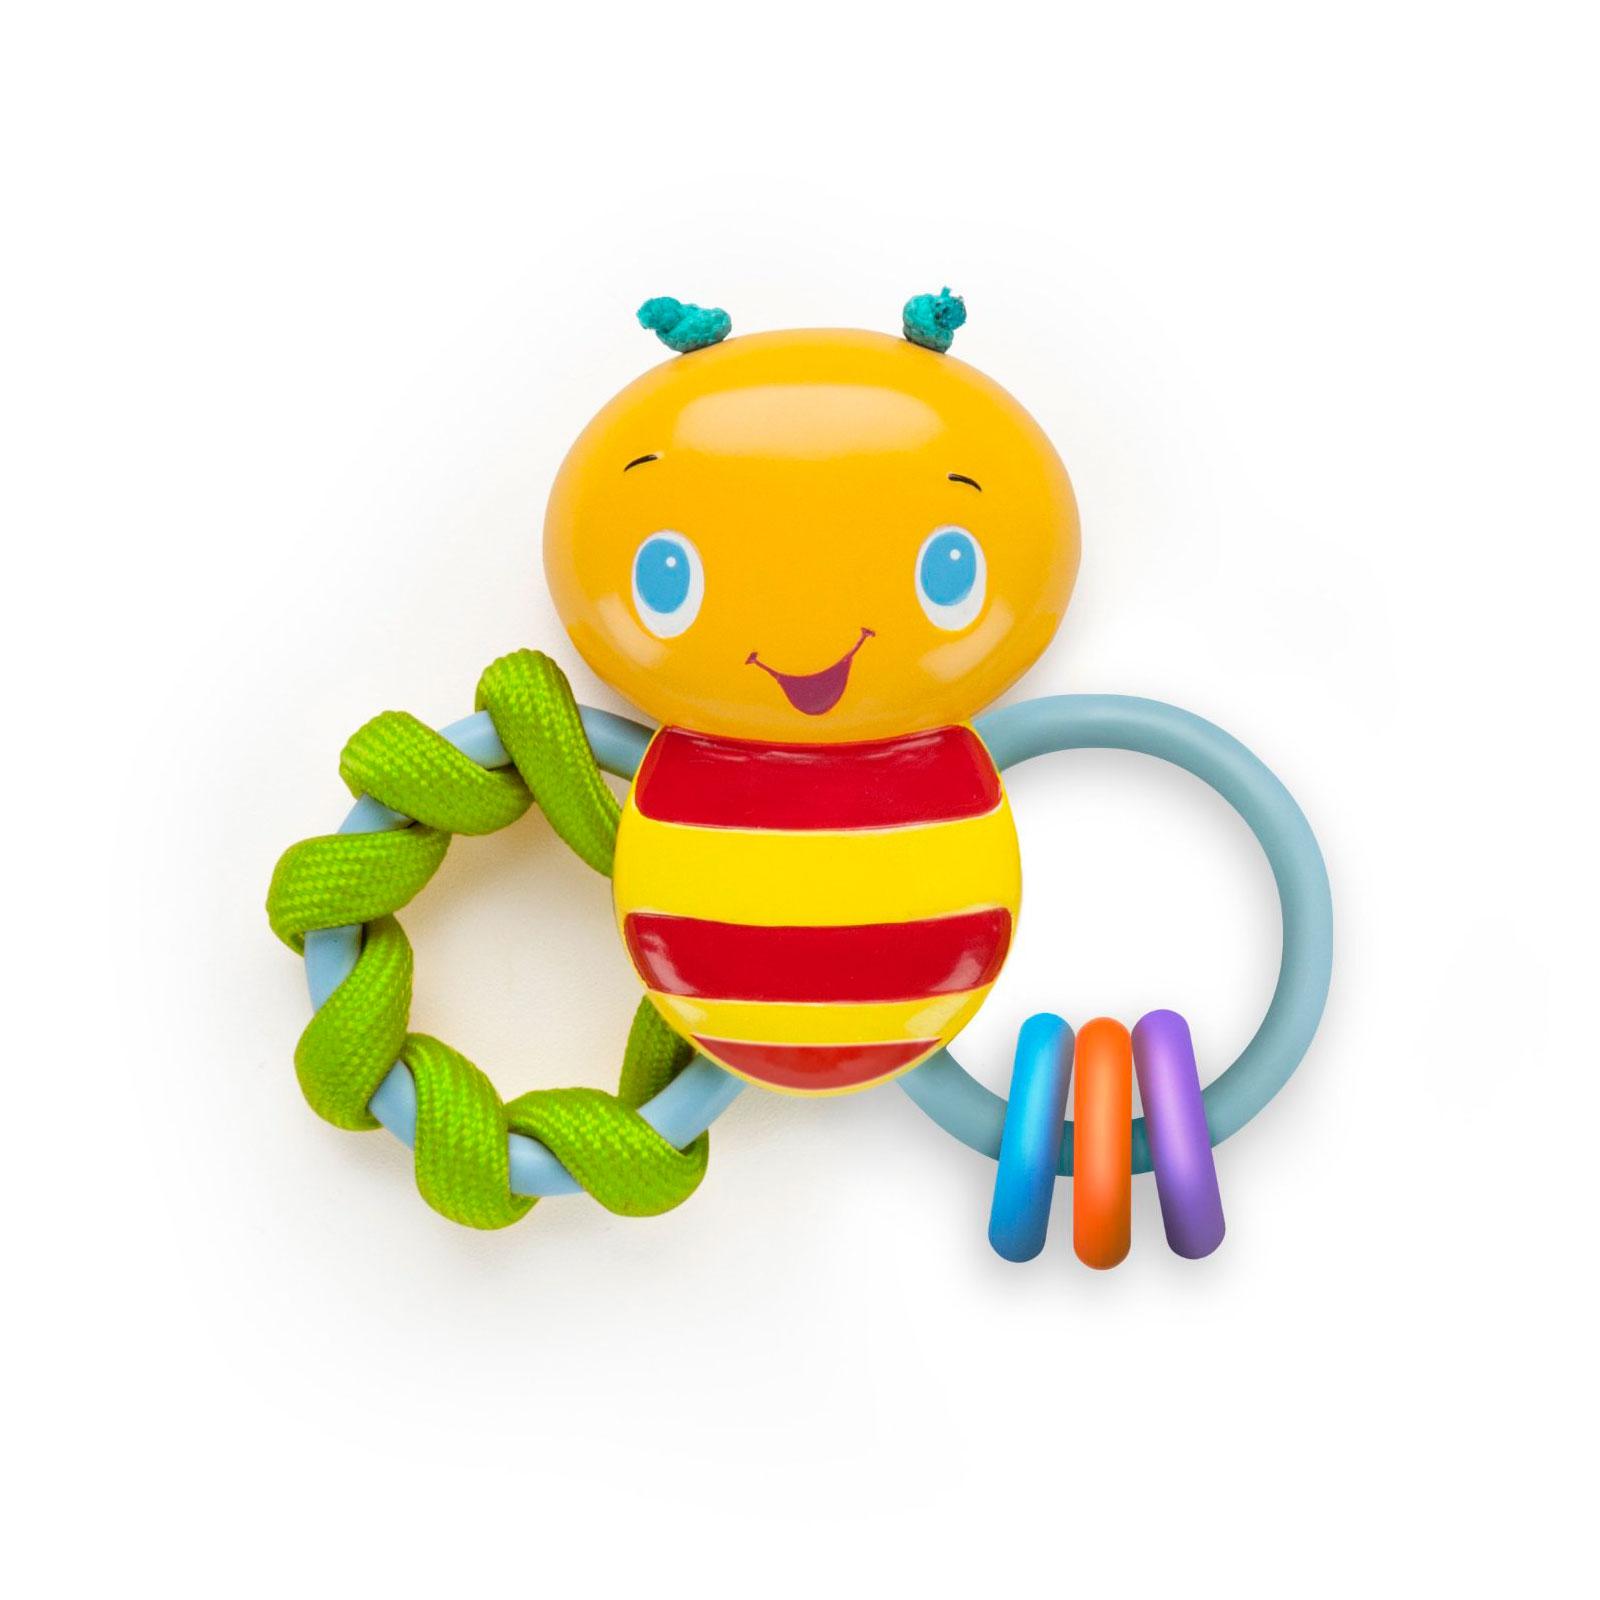 Погремушка Bright Starts Пчелка с 3 месяцев<br>